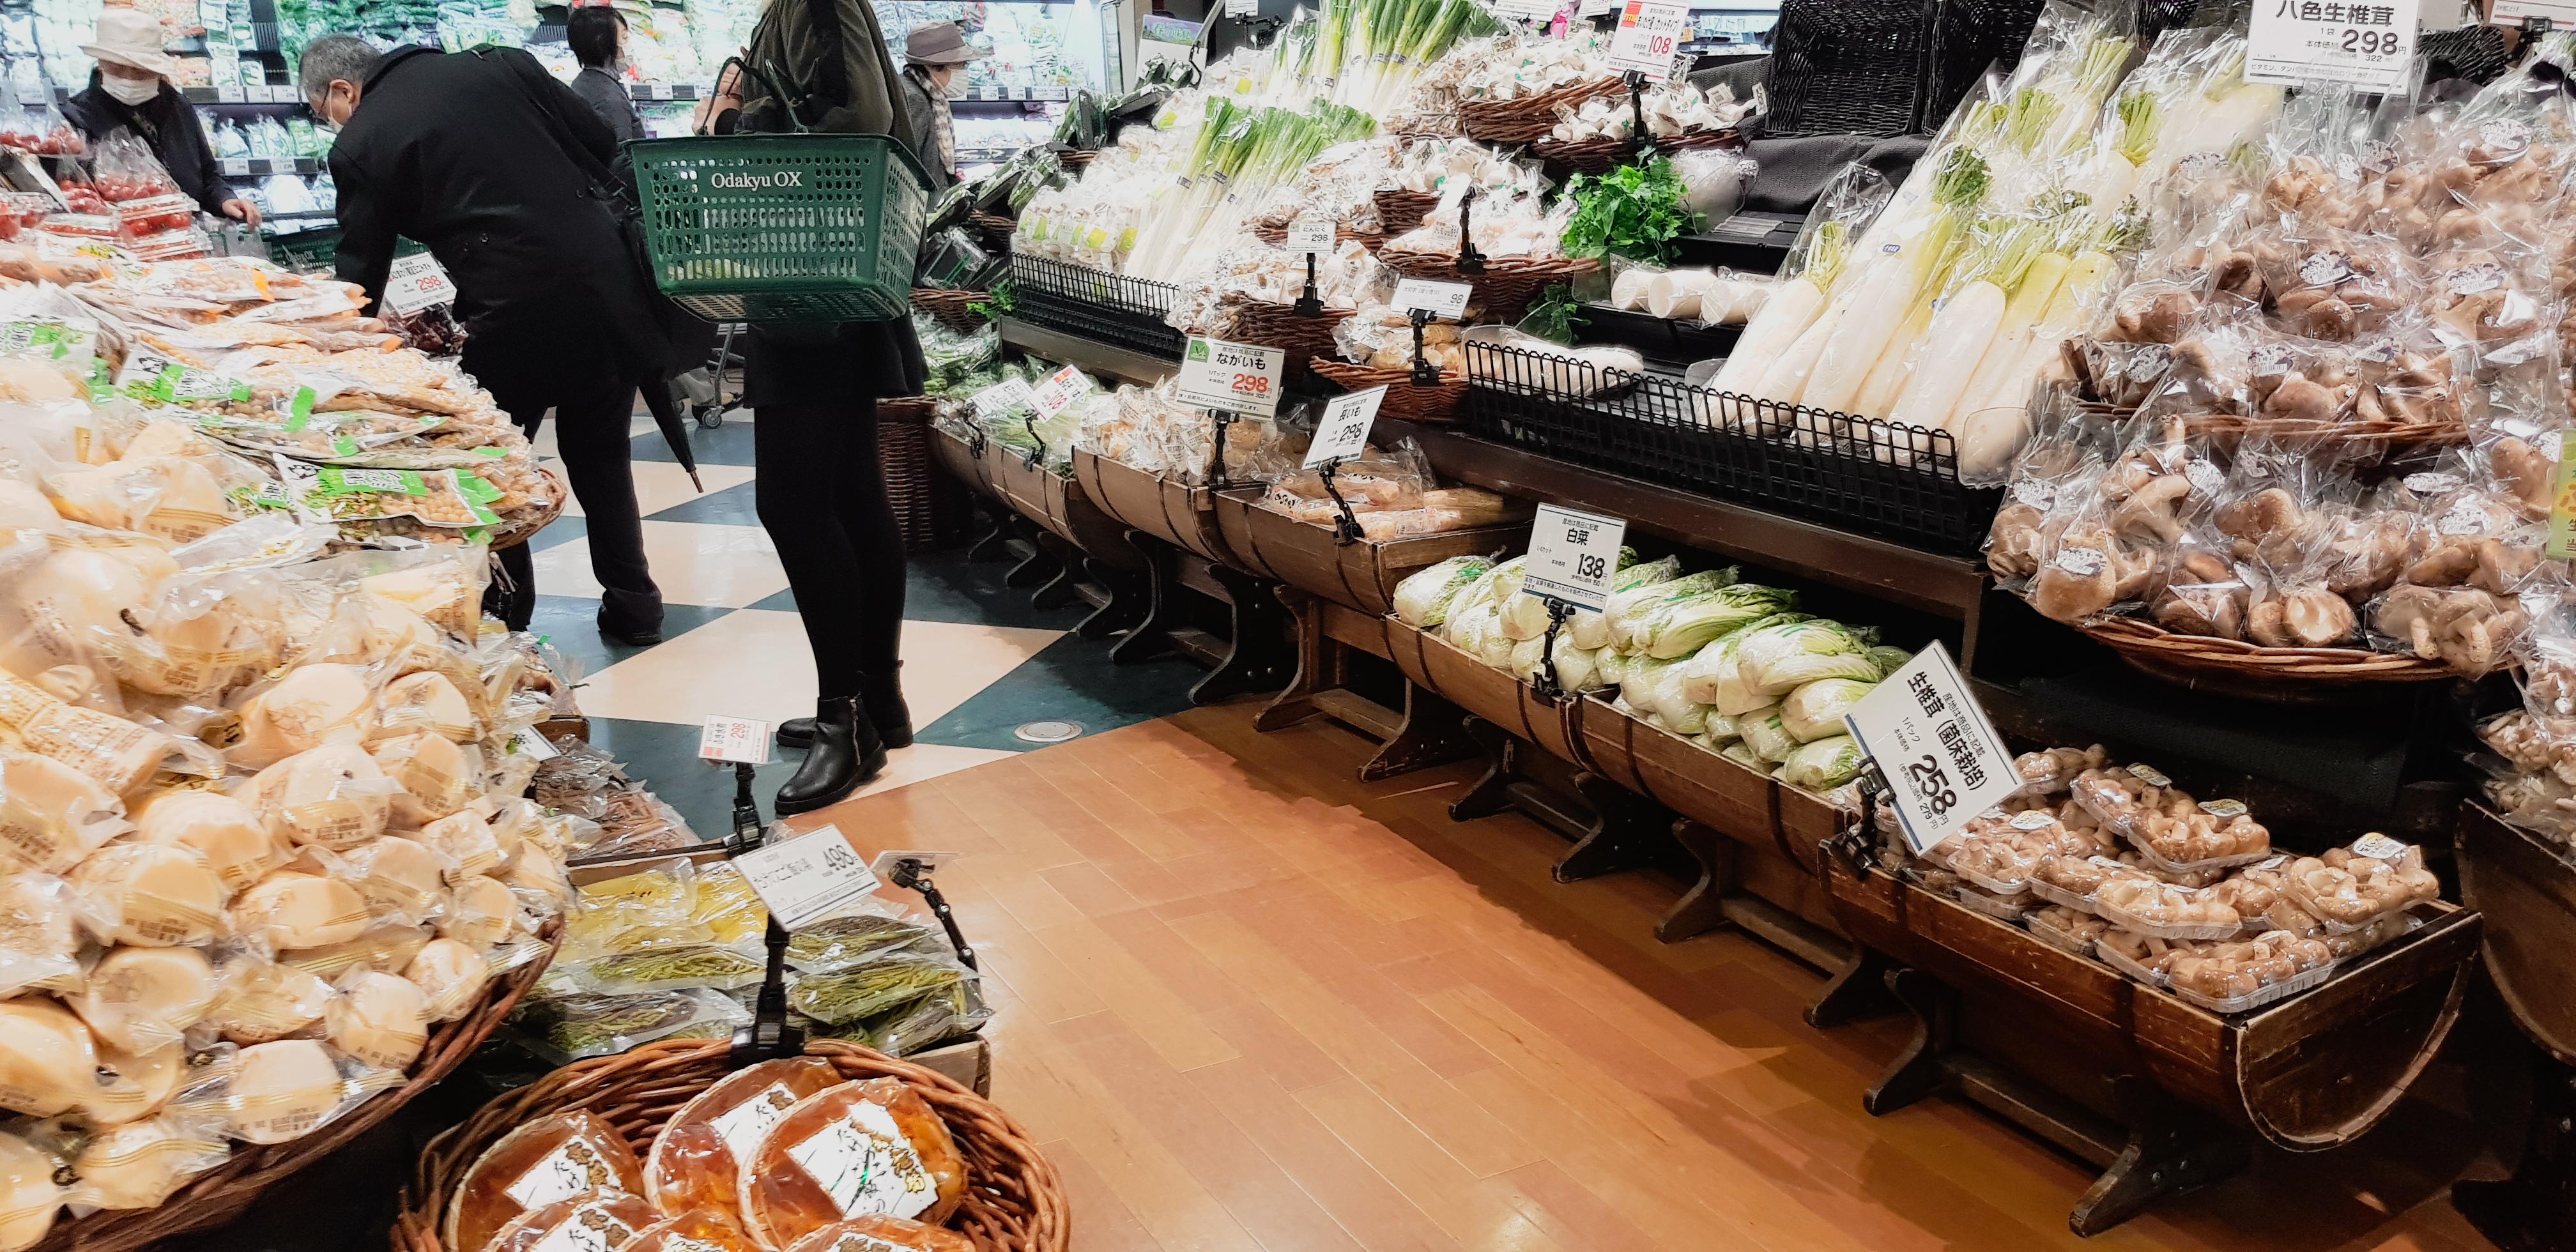 Japan has a serious plastic addiction